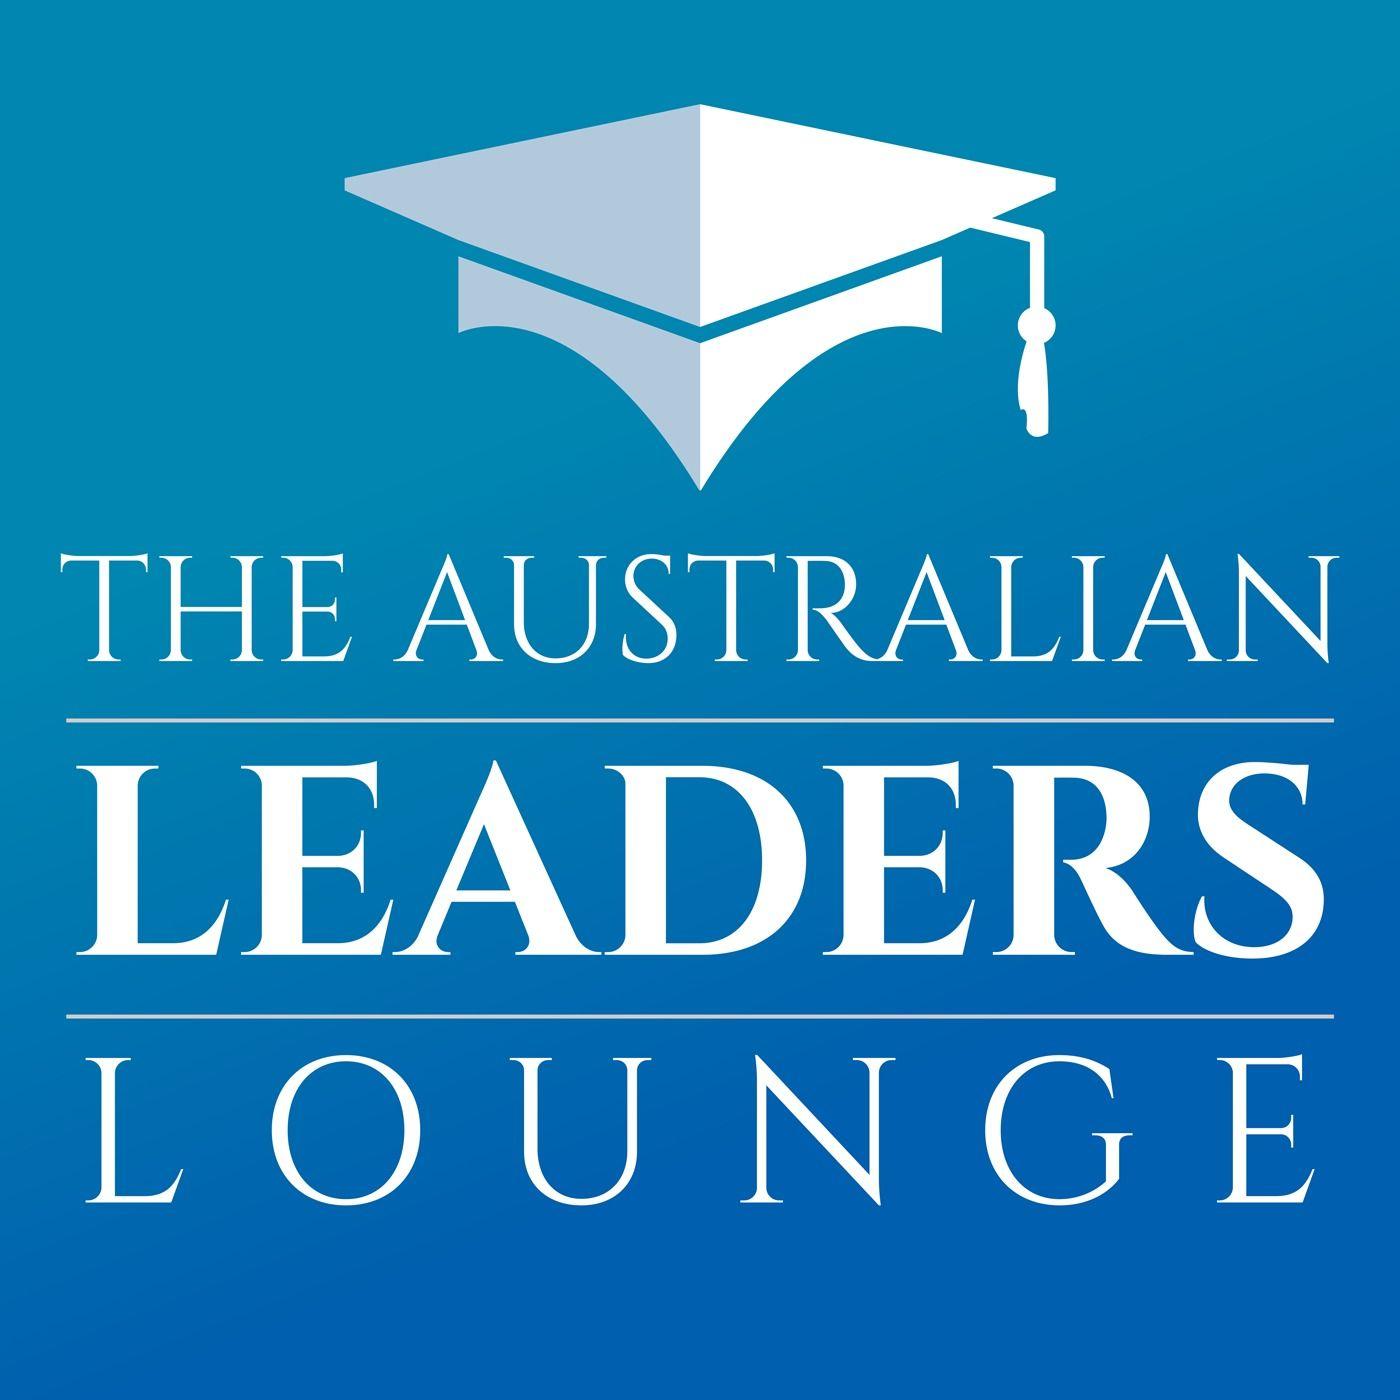 The Australian Leaders Lounge